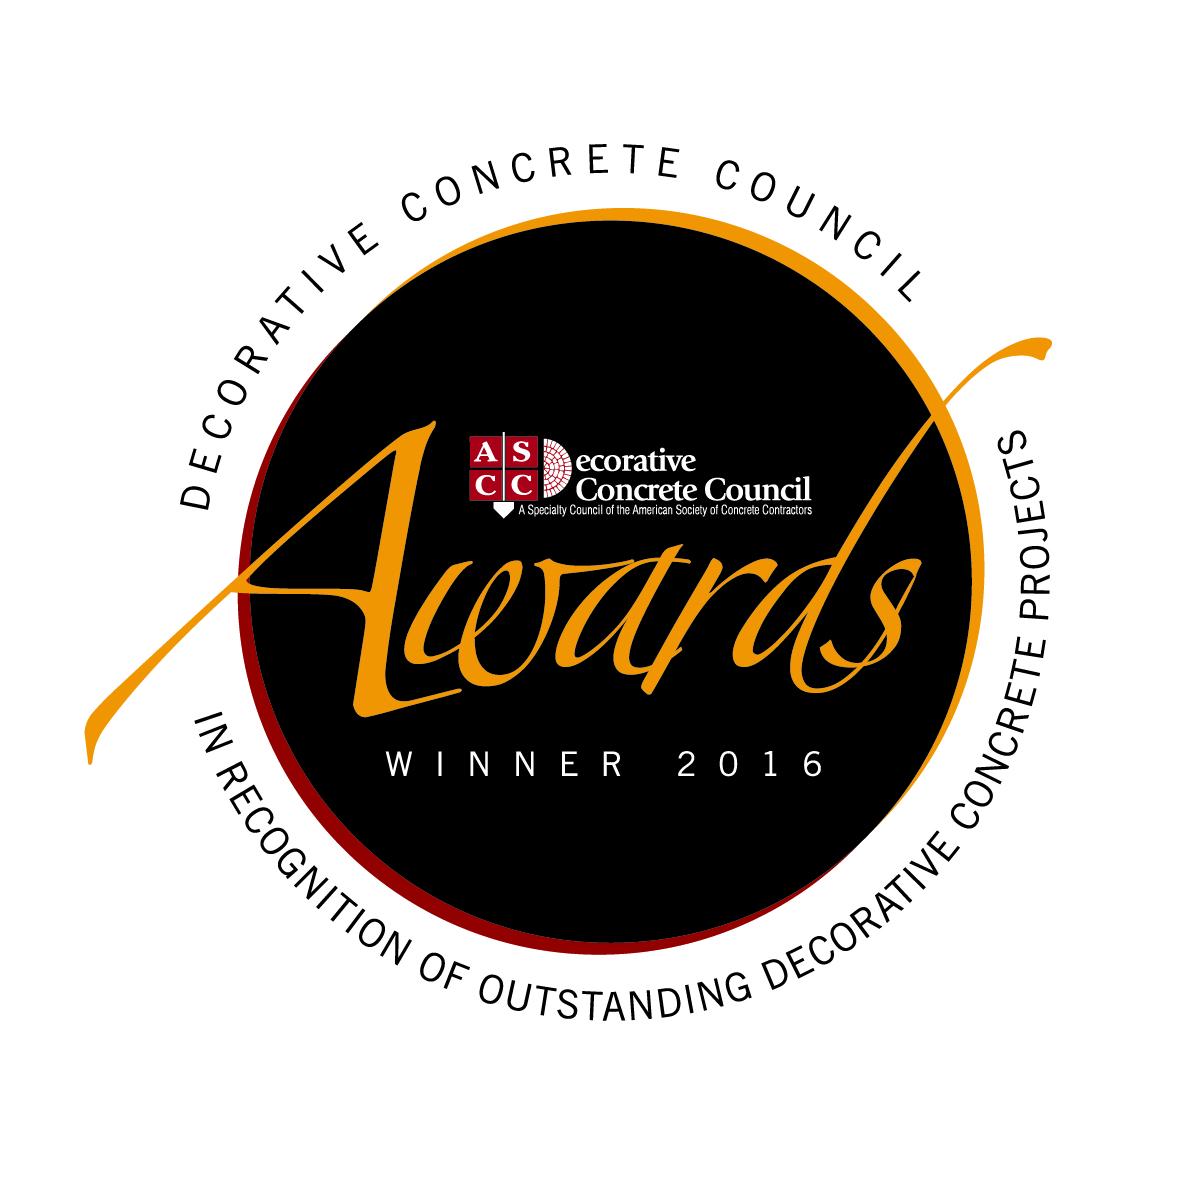 Decorative Concrete Council 2016 Project Awards Winner's Badge/Logo